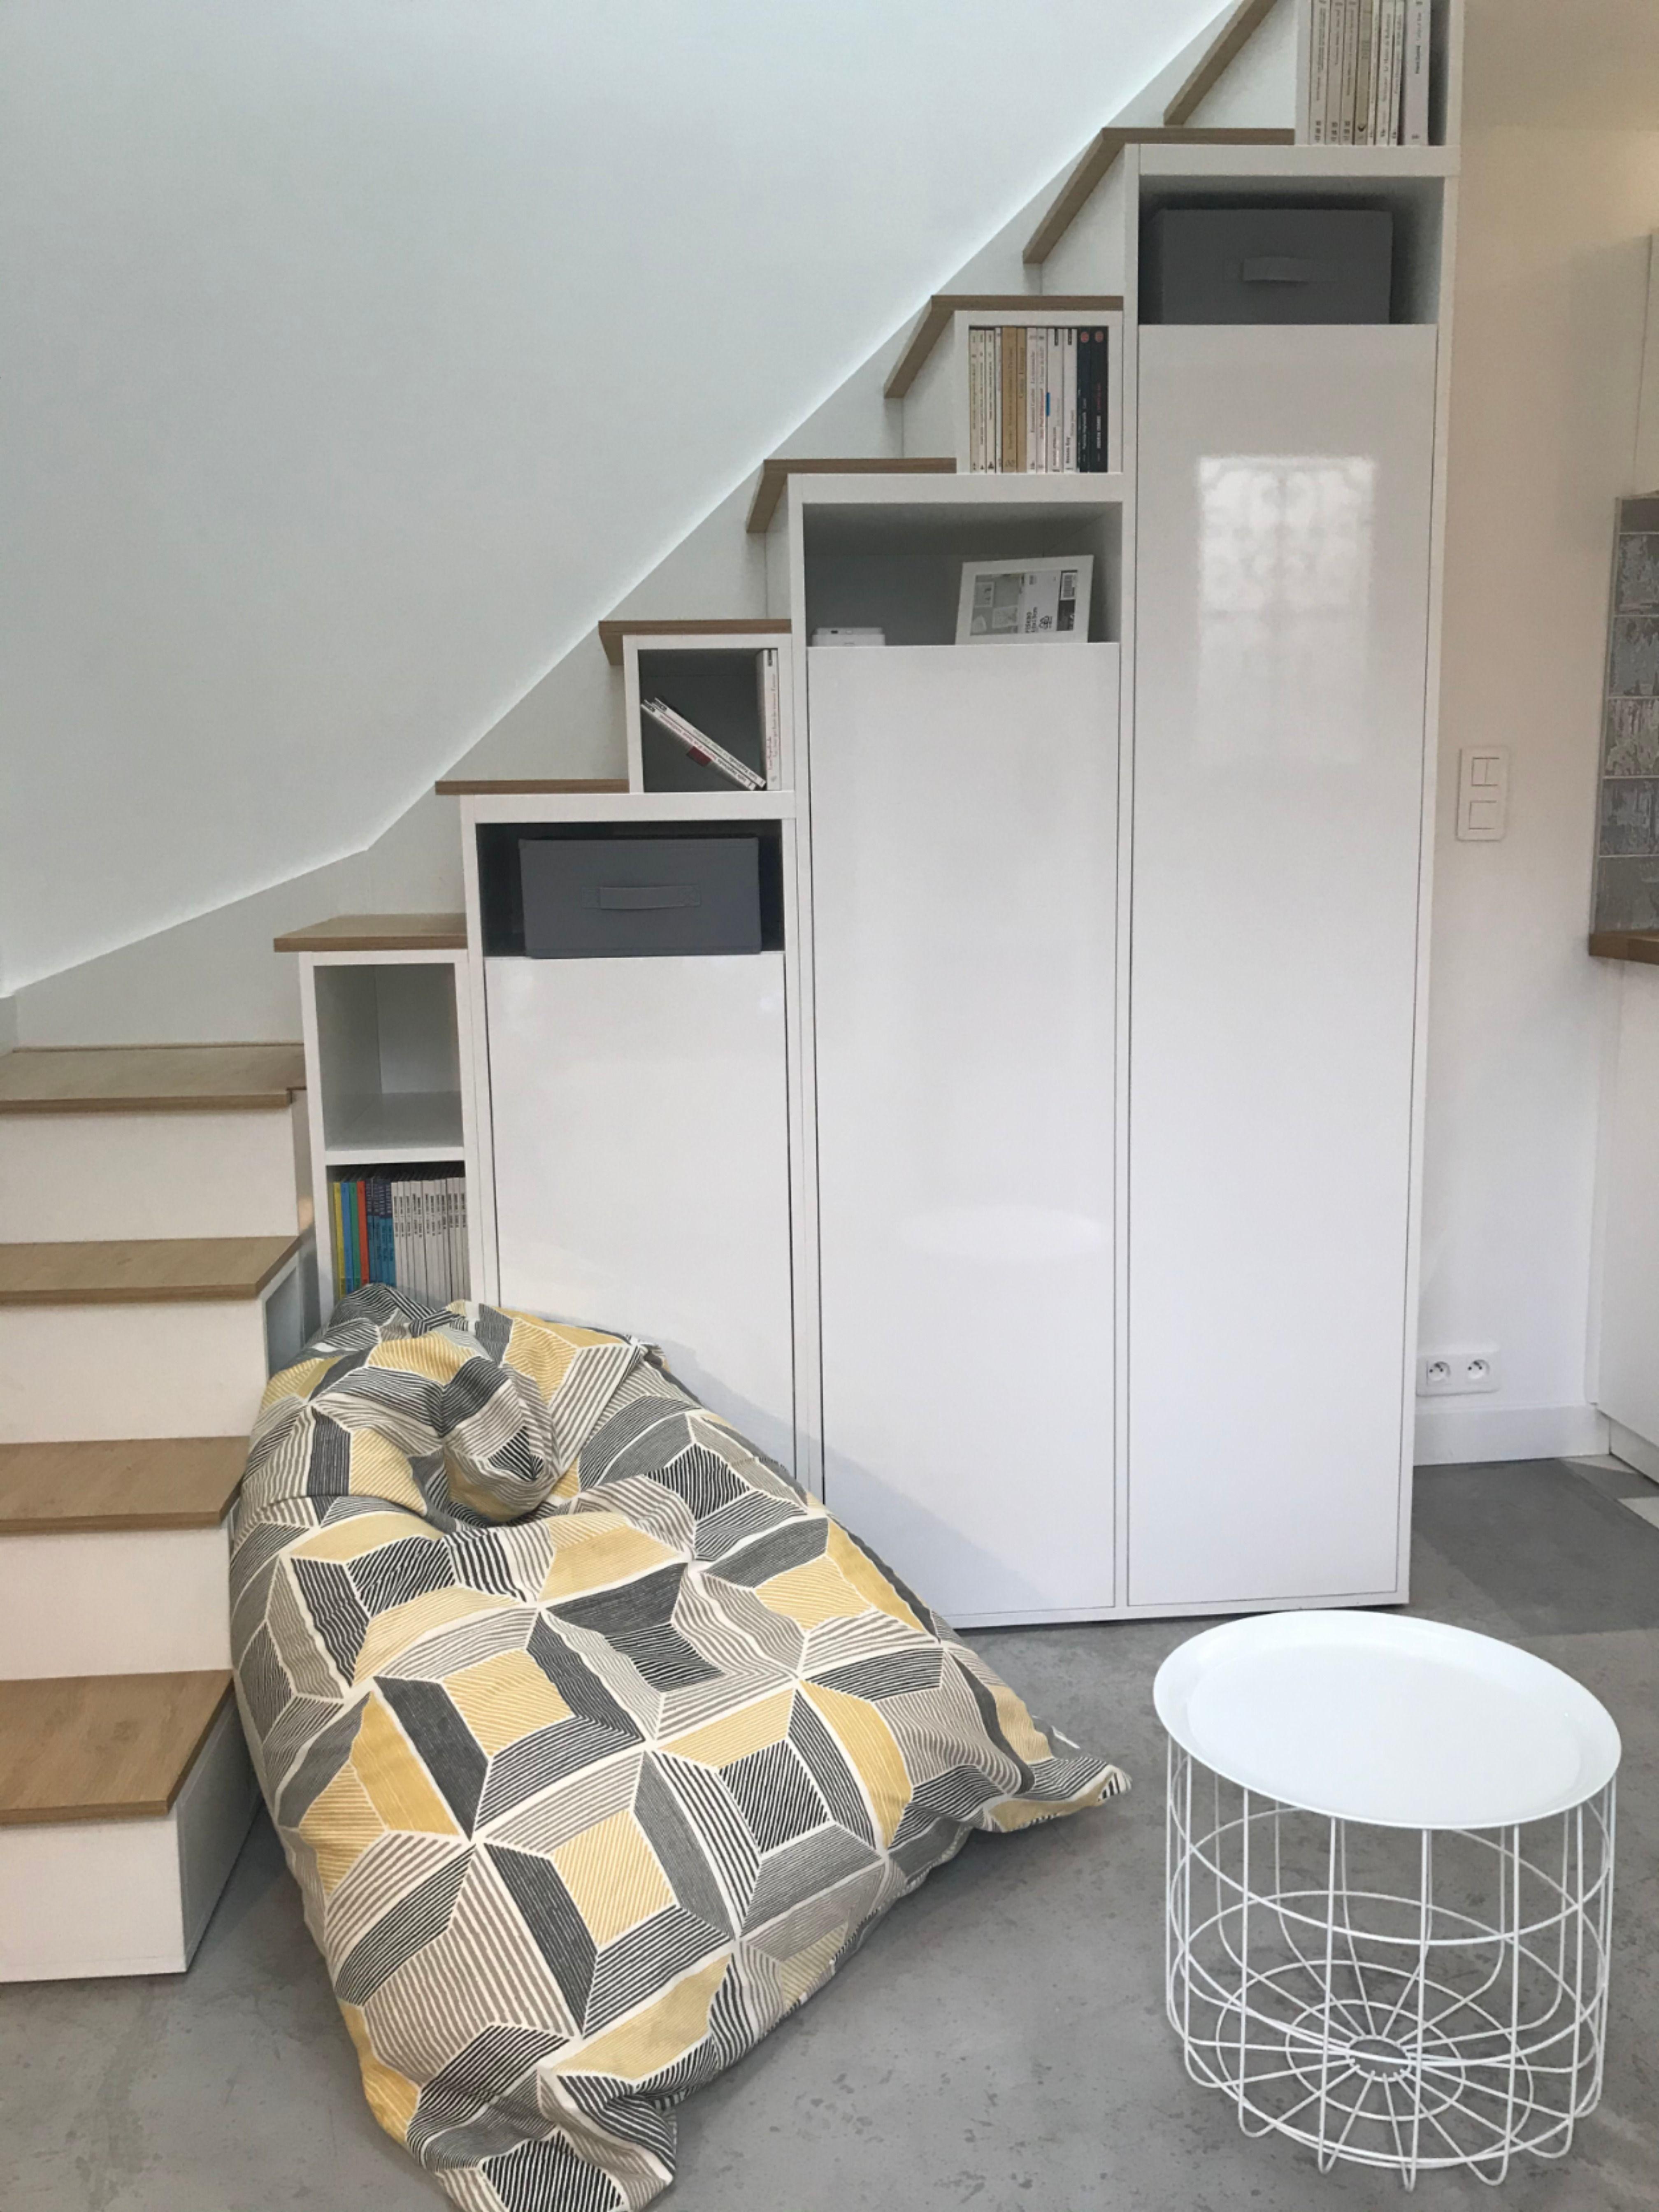 Meuble Escalier Quart Tournant En 2020 Meuble Escalier Mobilier De Salon Meubles Sur Mesure